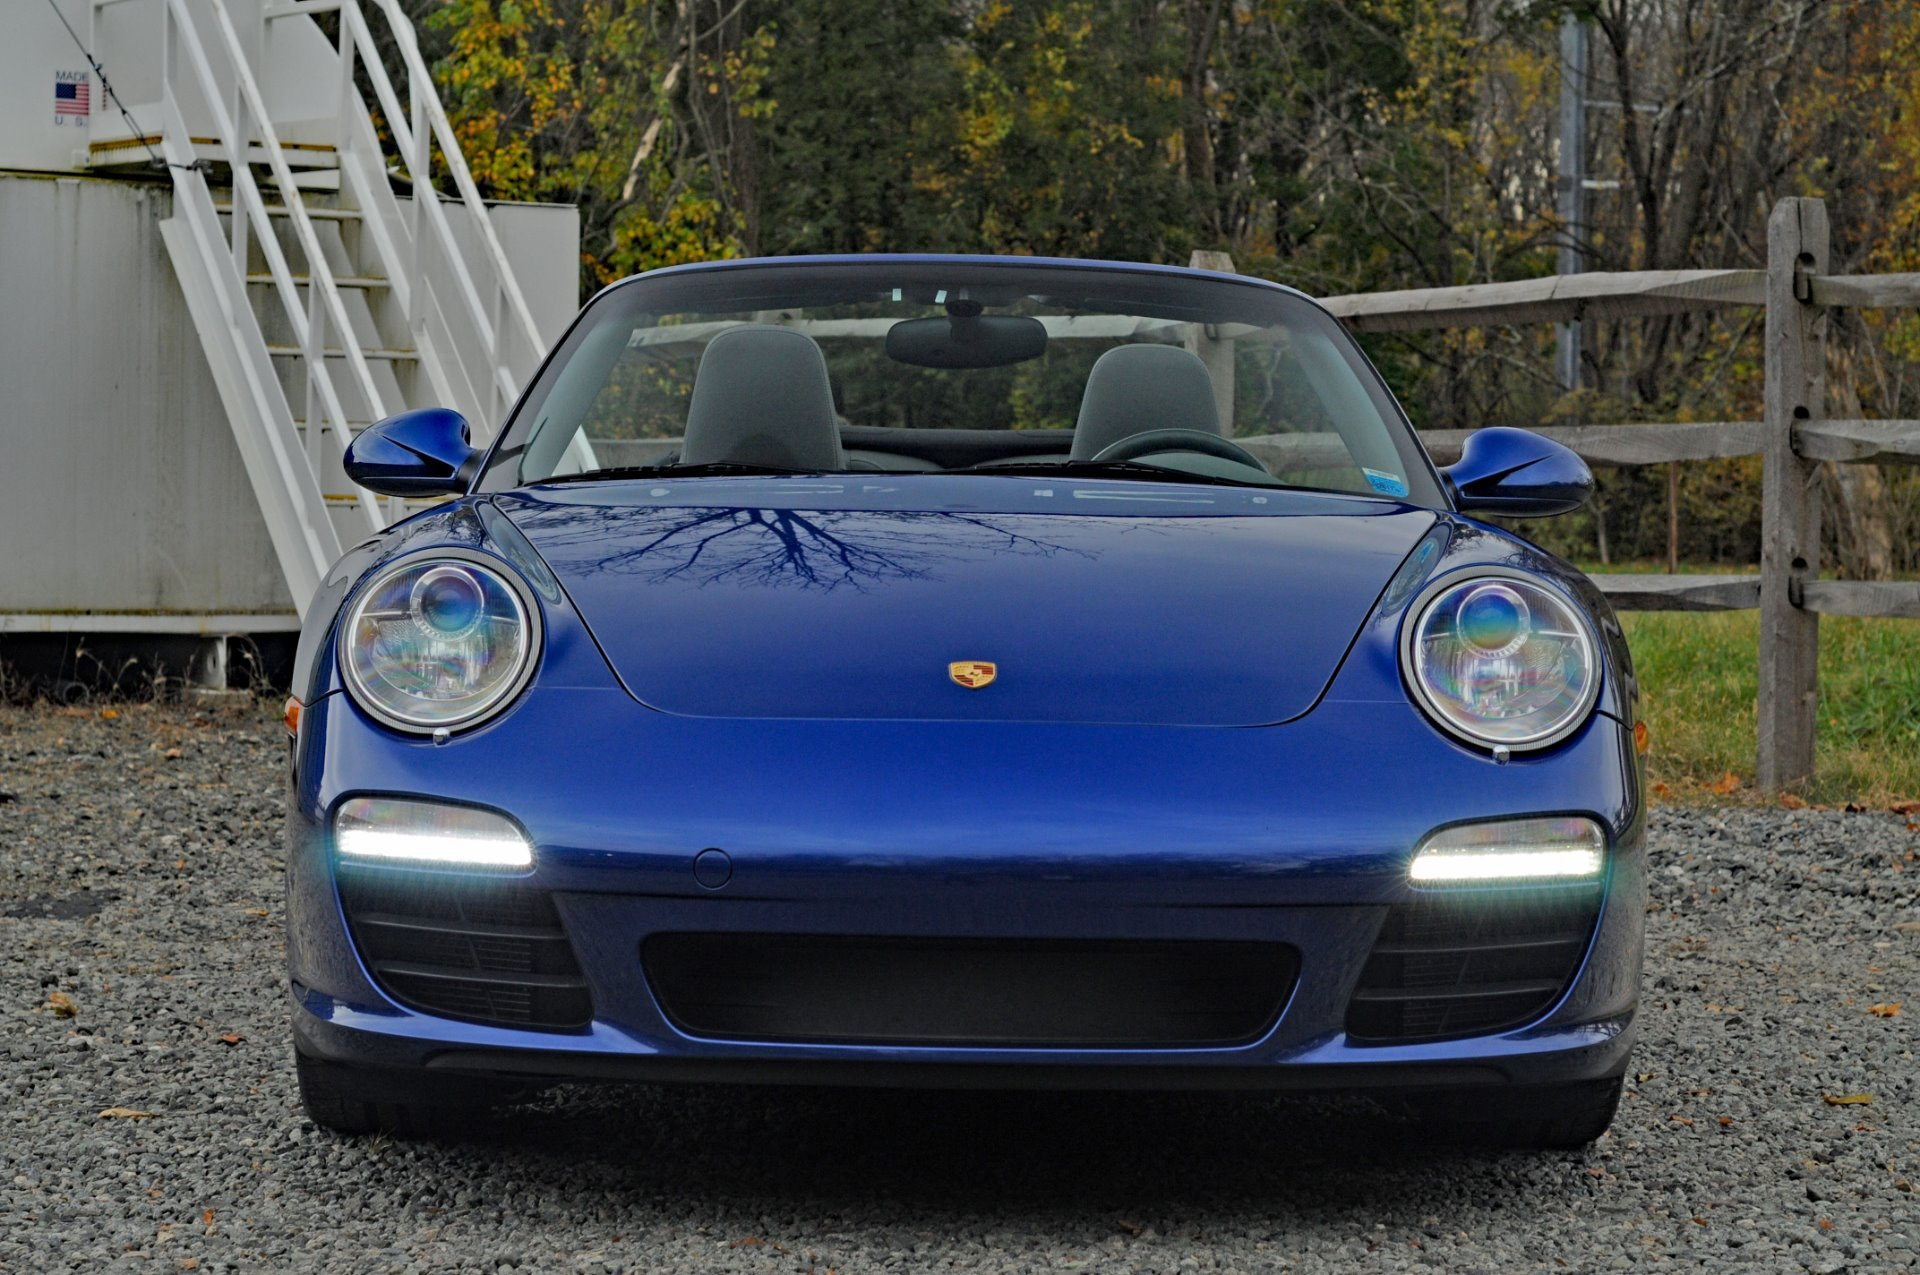 2009 Porsche 911 Carrera S Cabriolet Pdk Stock   2375 For